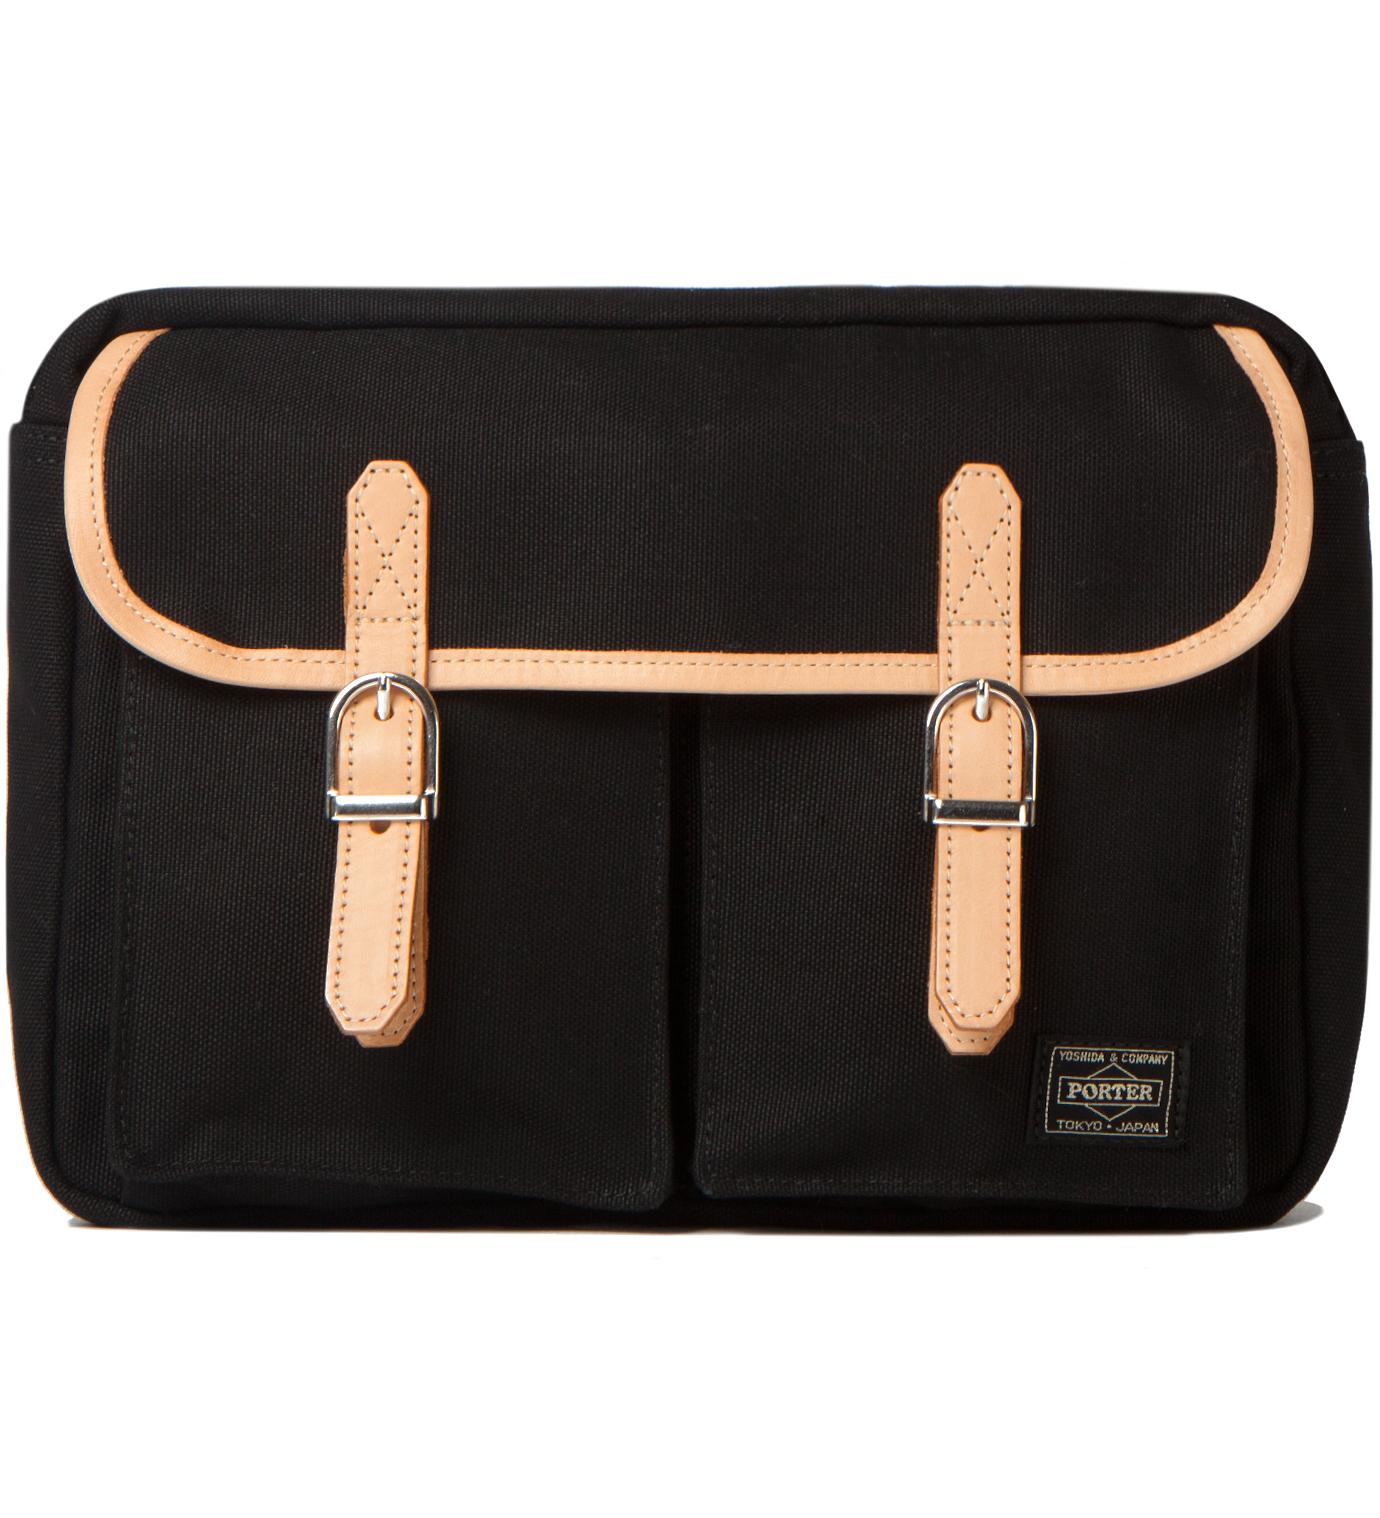 Head Porter Black LX x Canvas Shoulder Bag